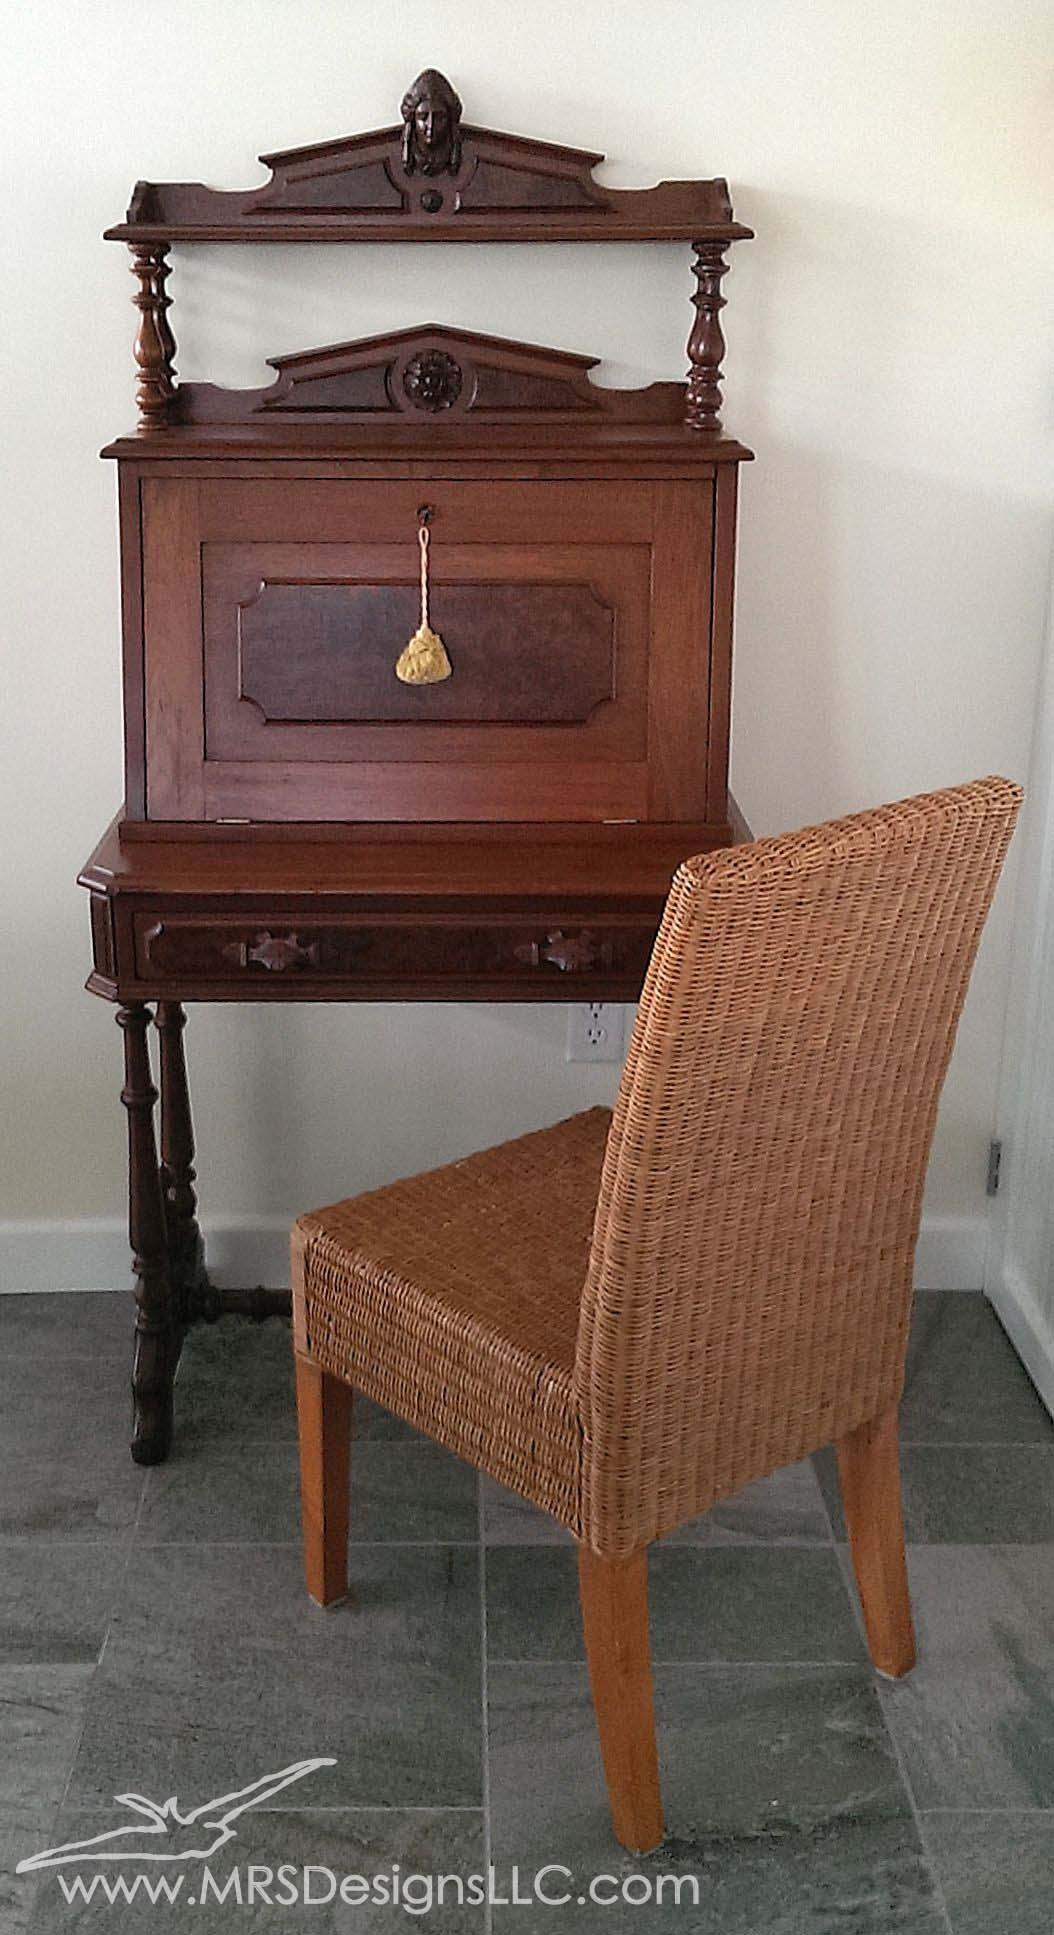 MRS Designs Blog - Refinishing a Vintage Secretary Desk